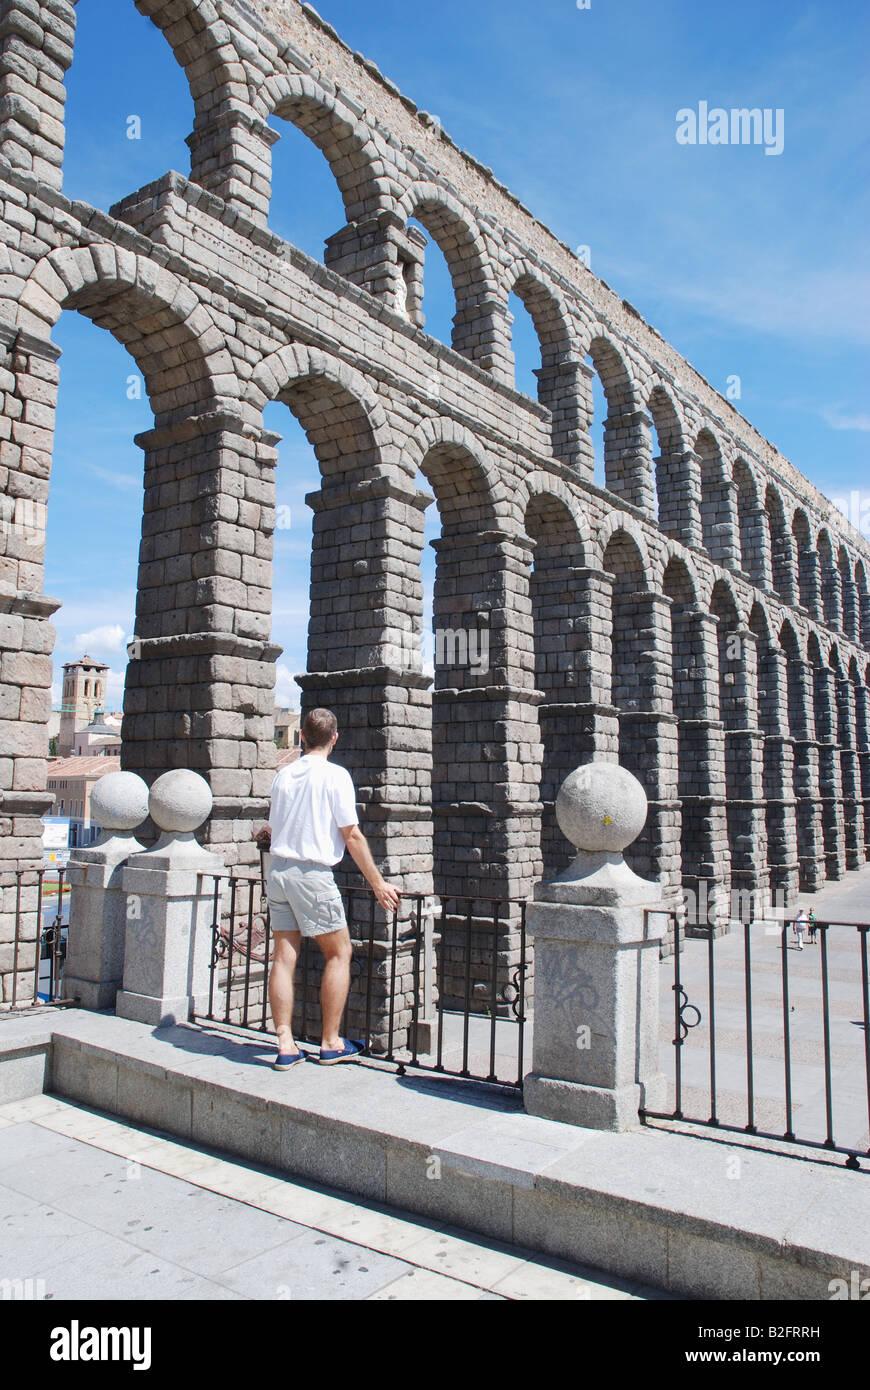 Roman Aqueduct from viewpoint. Segovia. Castile Leon. Spain. - Stock Image